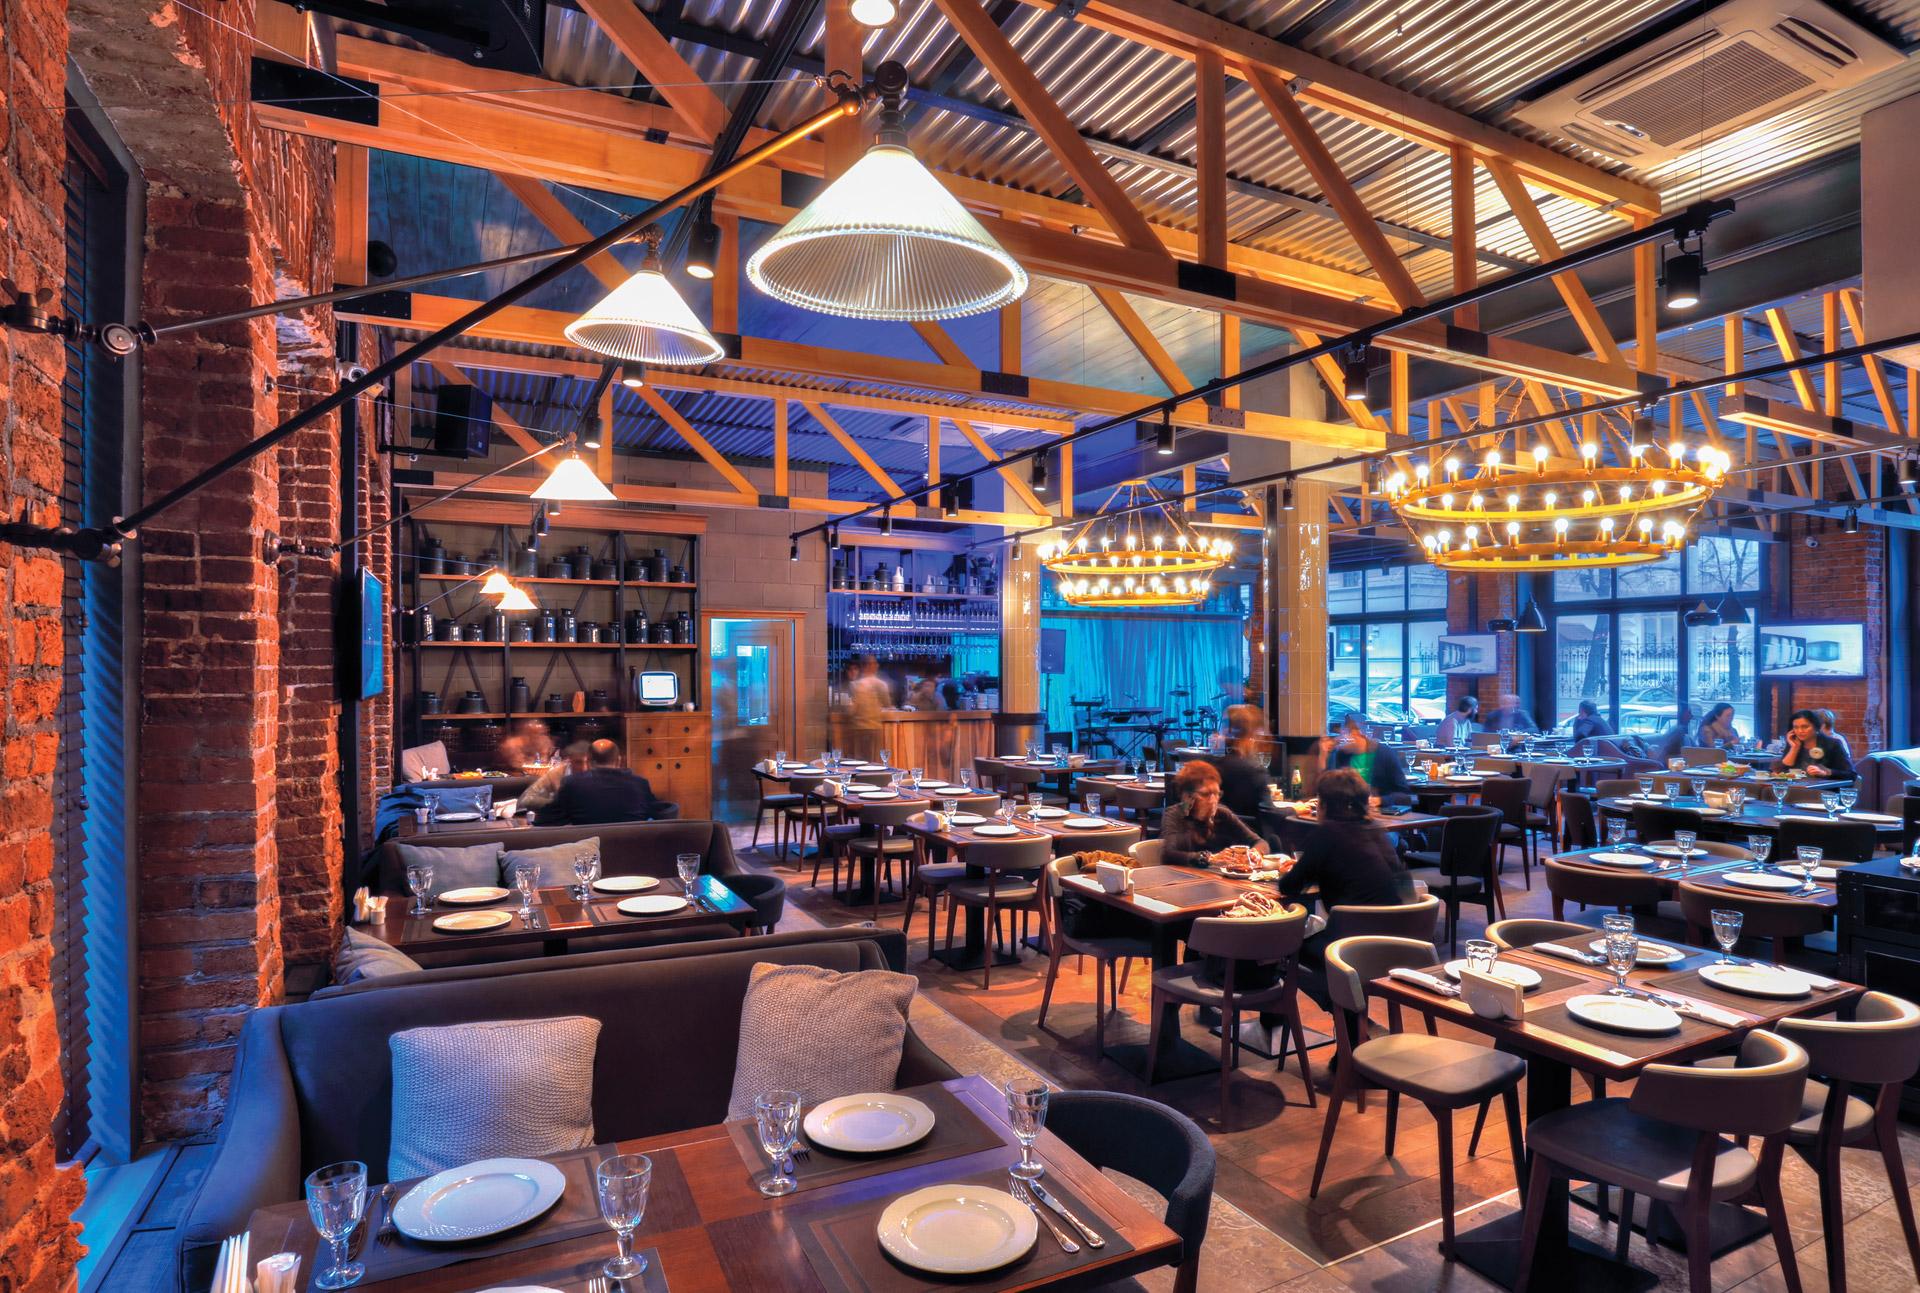 A careful selection of industrial restaurant lights at Café Khinkalnaya, Moscow